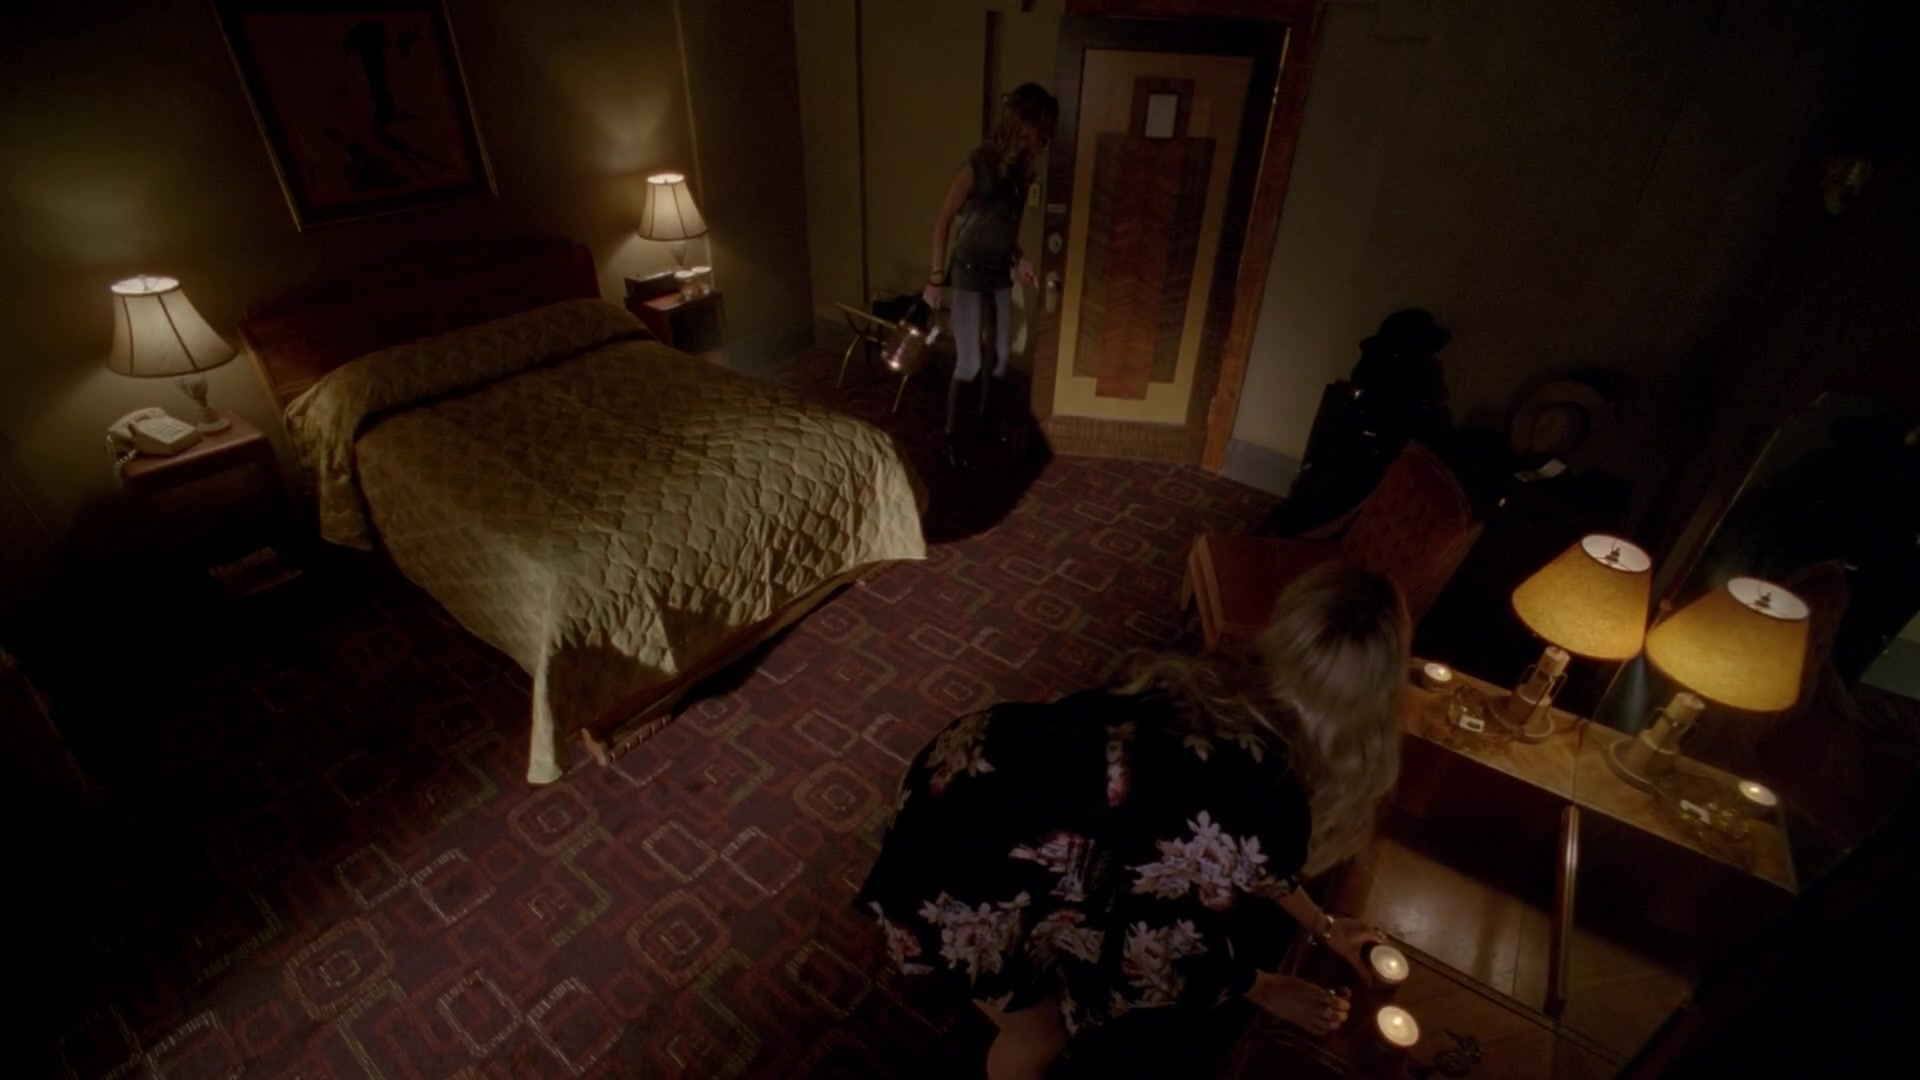 image hotel cortez room 001jpeg american horror story wiki fandom powered by wikia - Dark Hardwood Hotel 2015